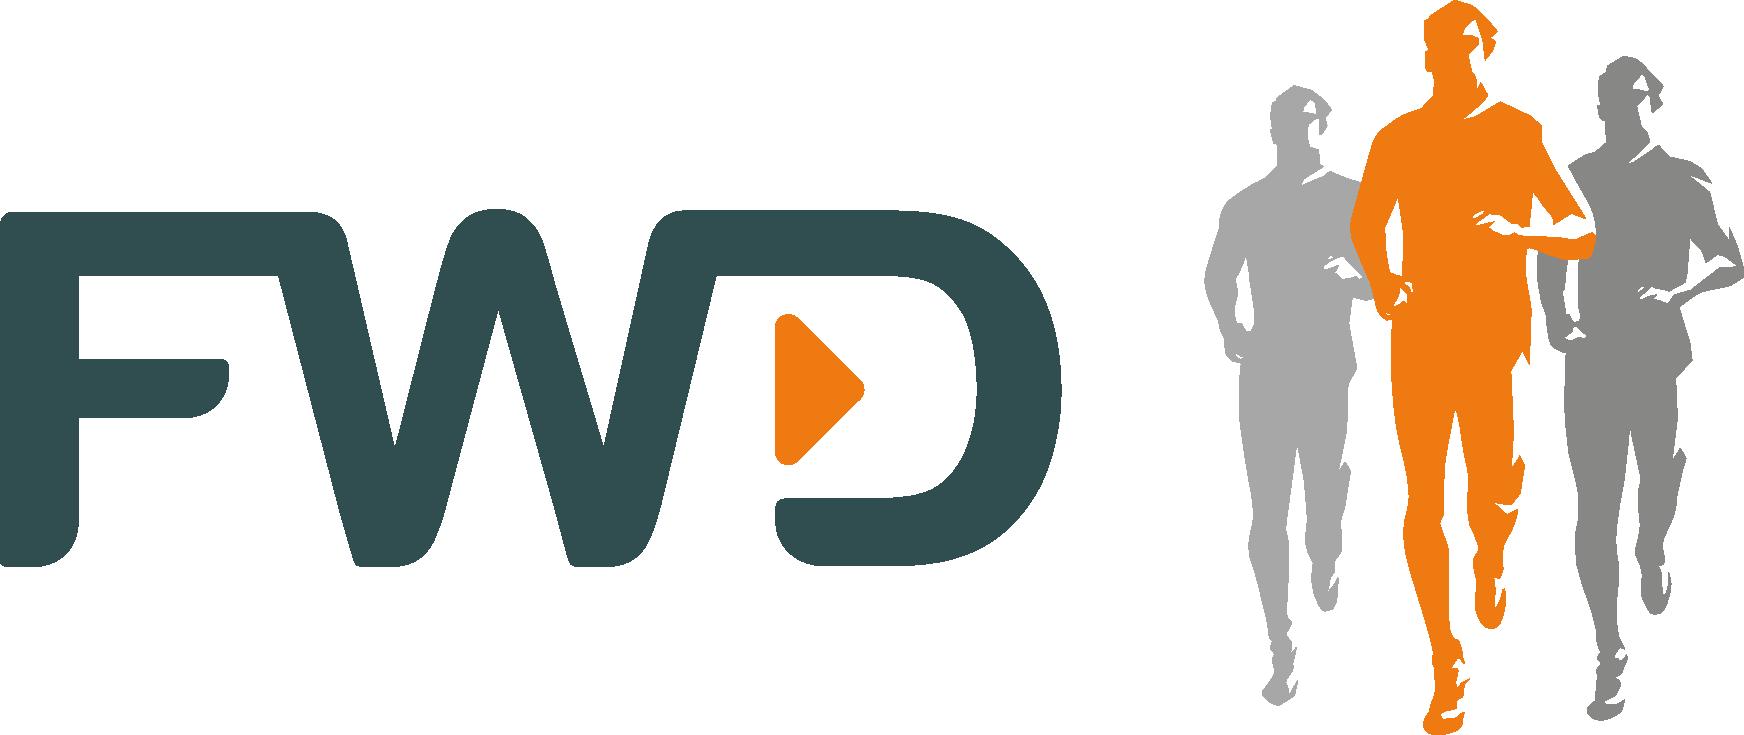 logo_fwd